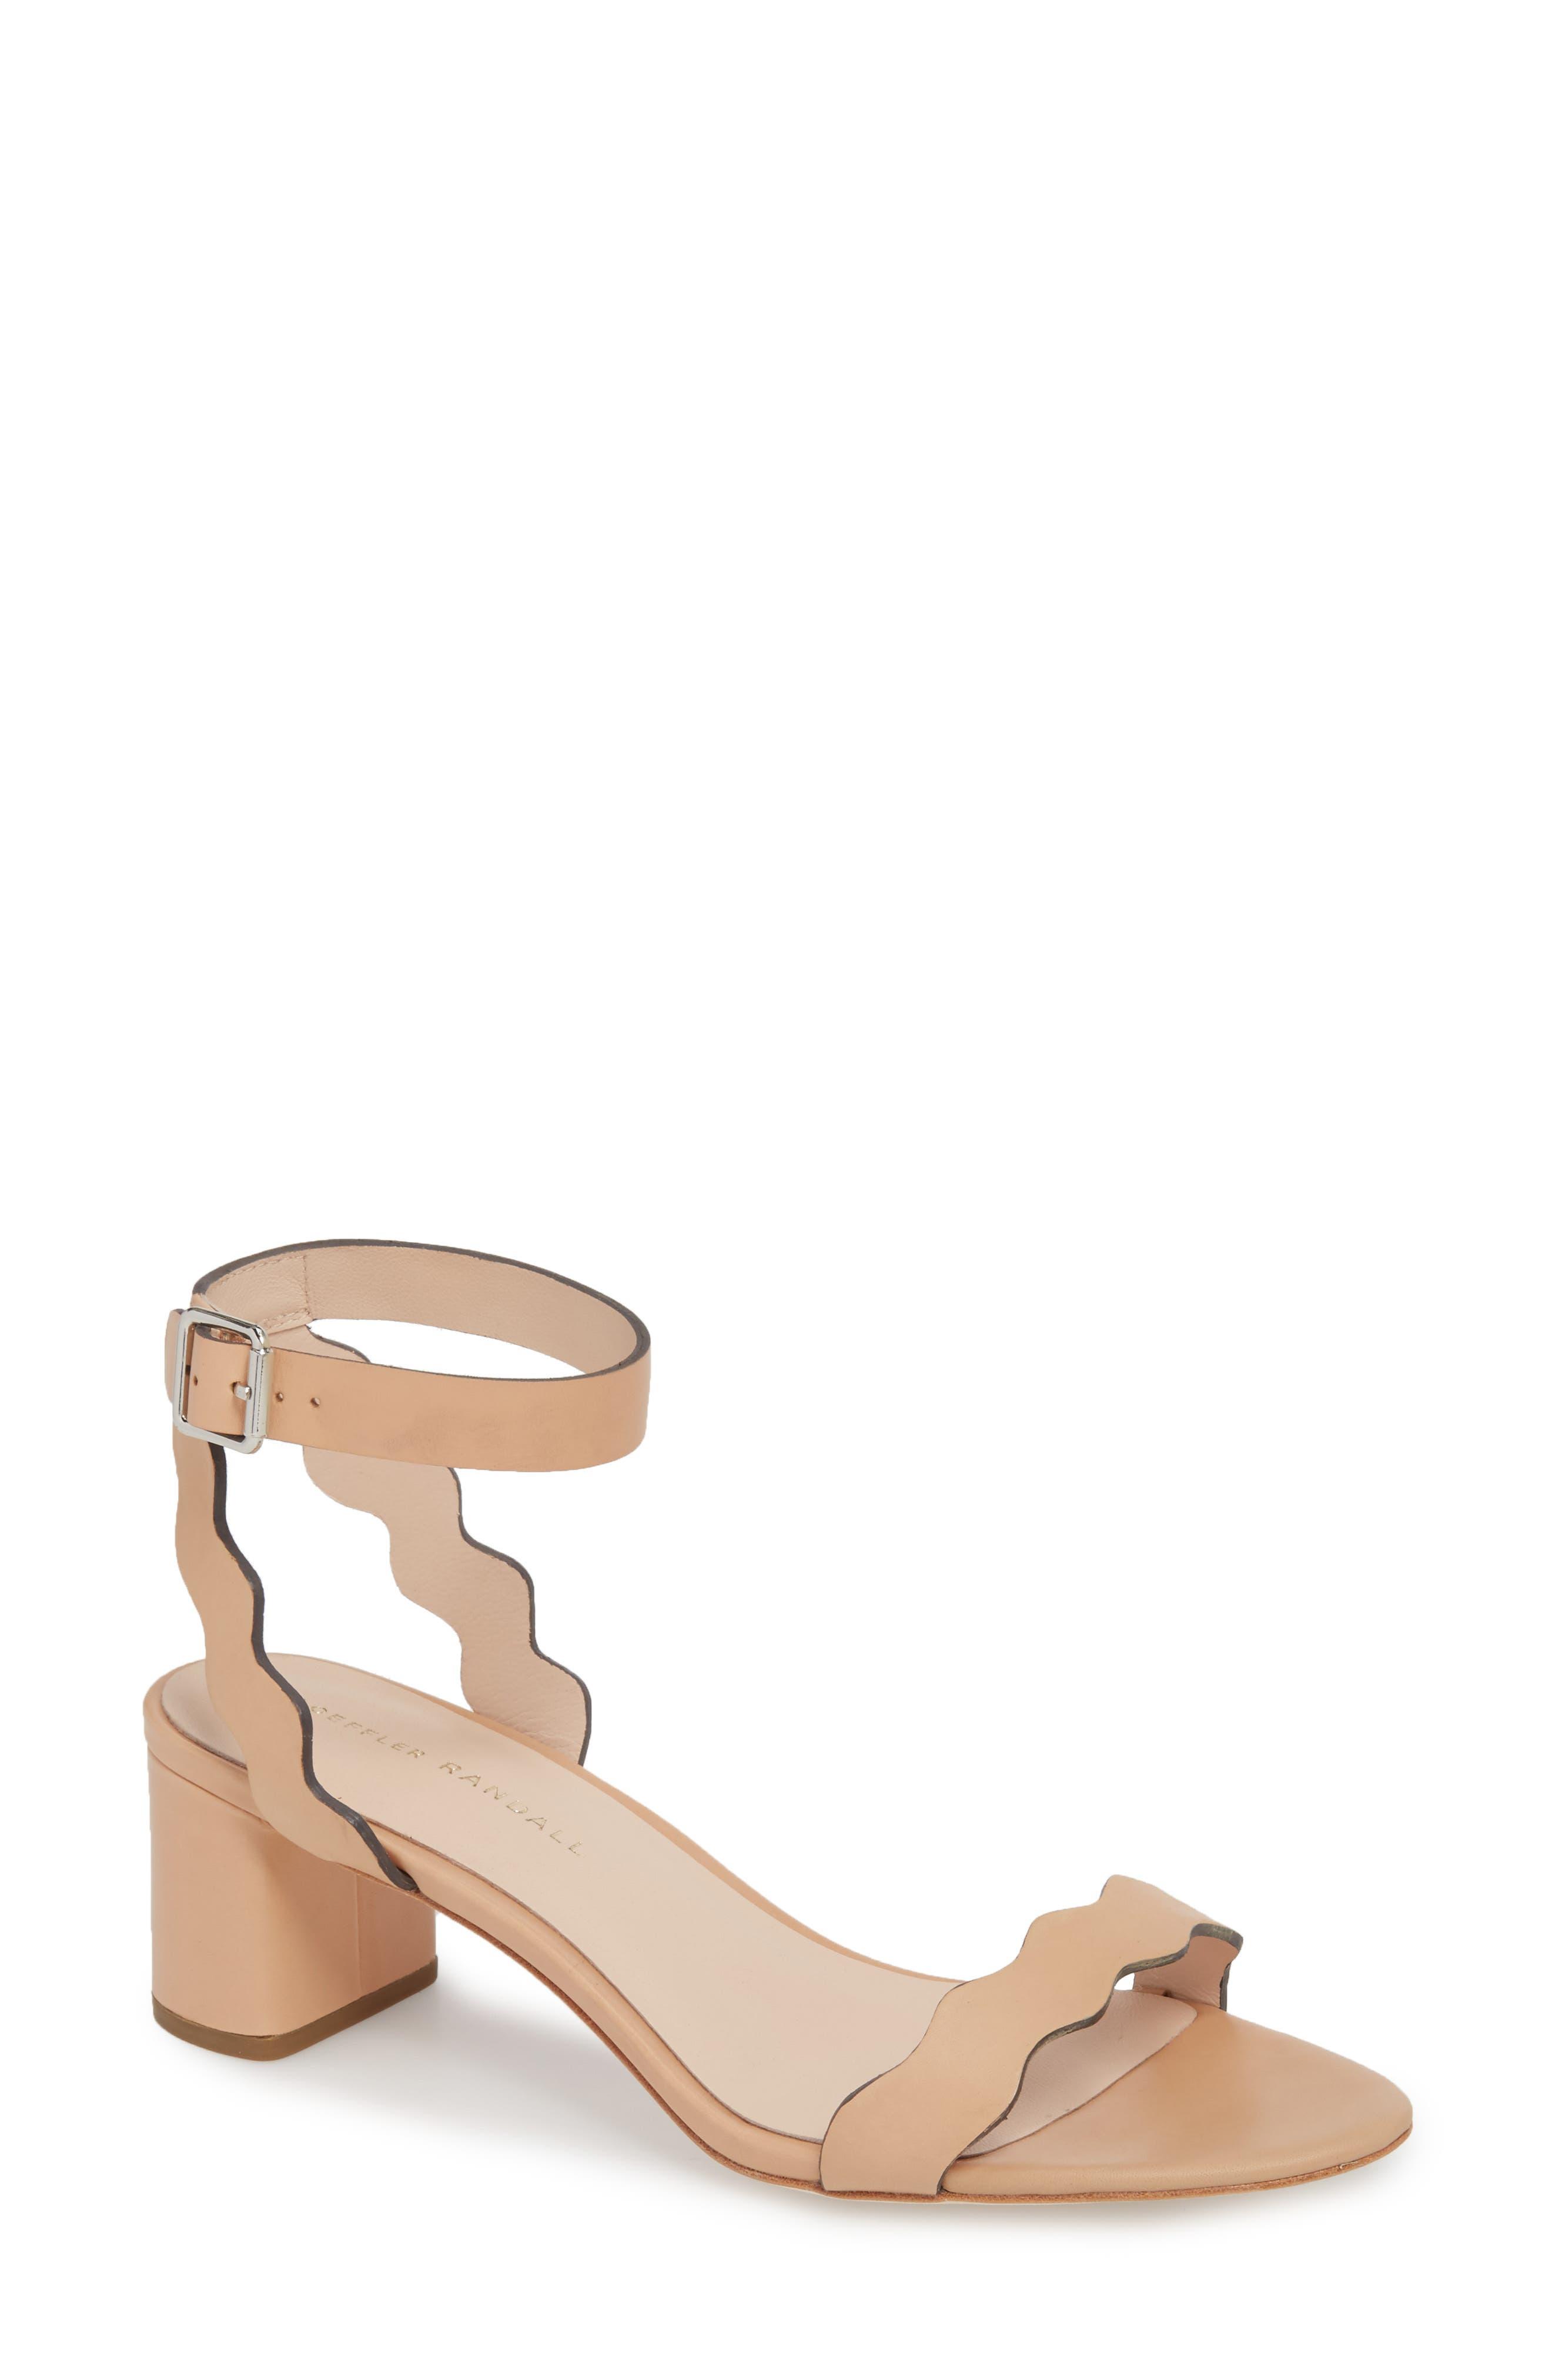 Emi Scalloped Sandal,                             Main thumbnail 1, color,                             Wheat